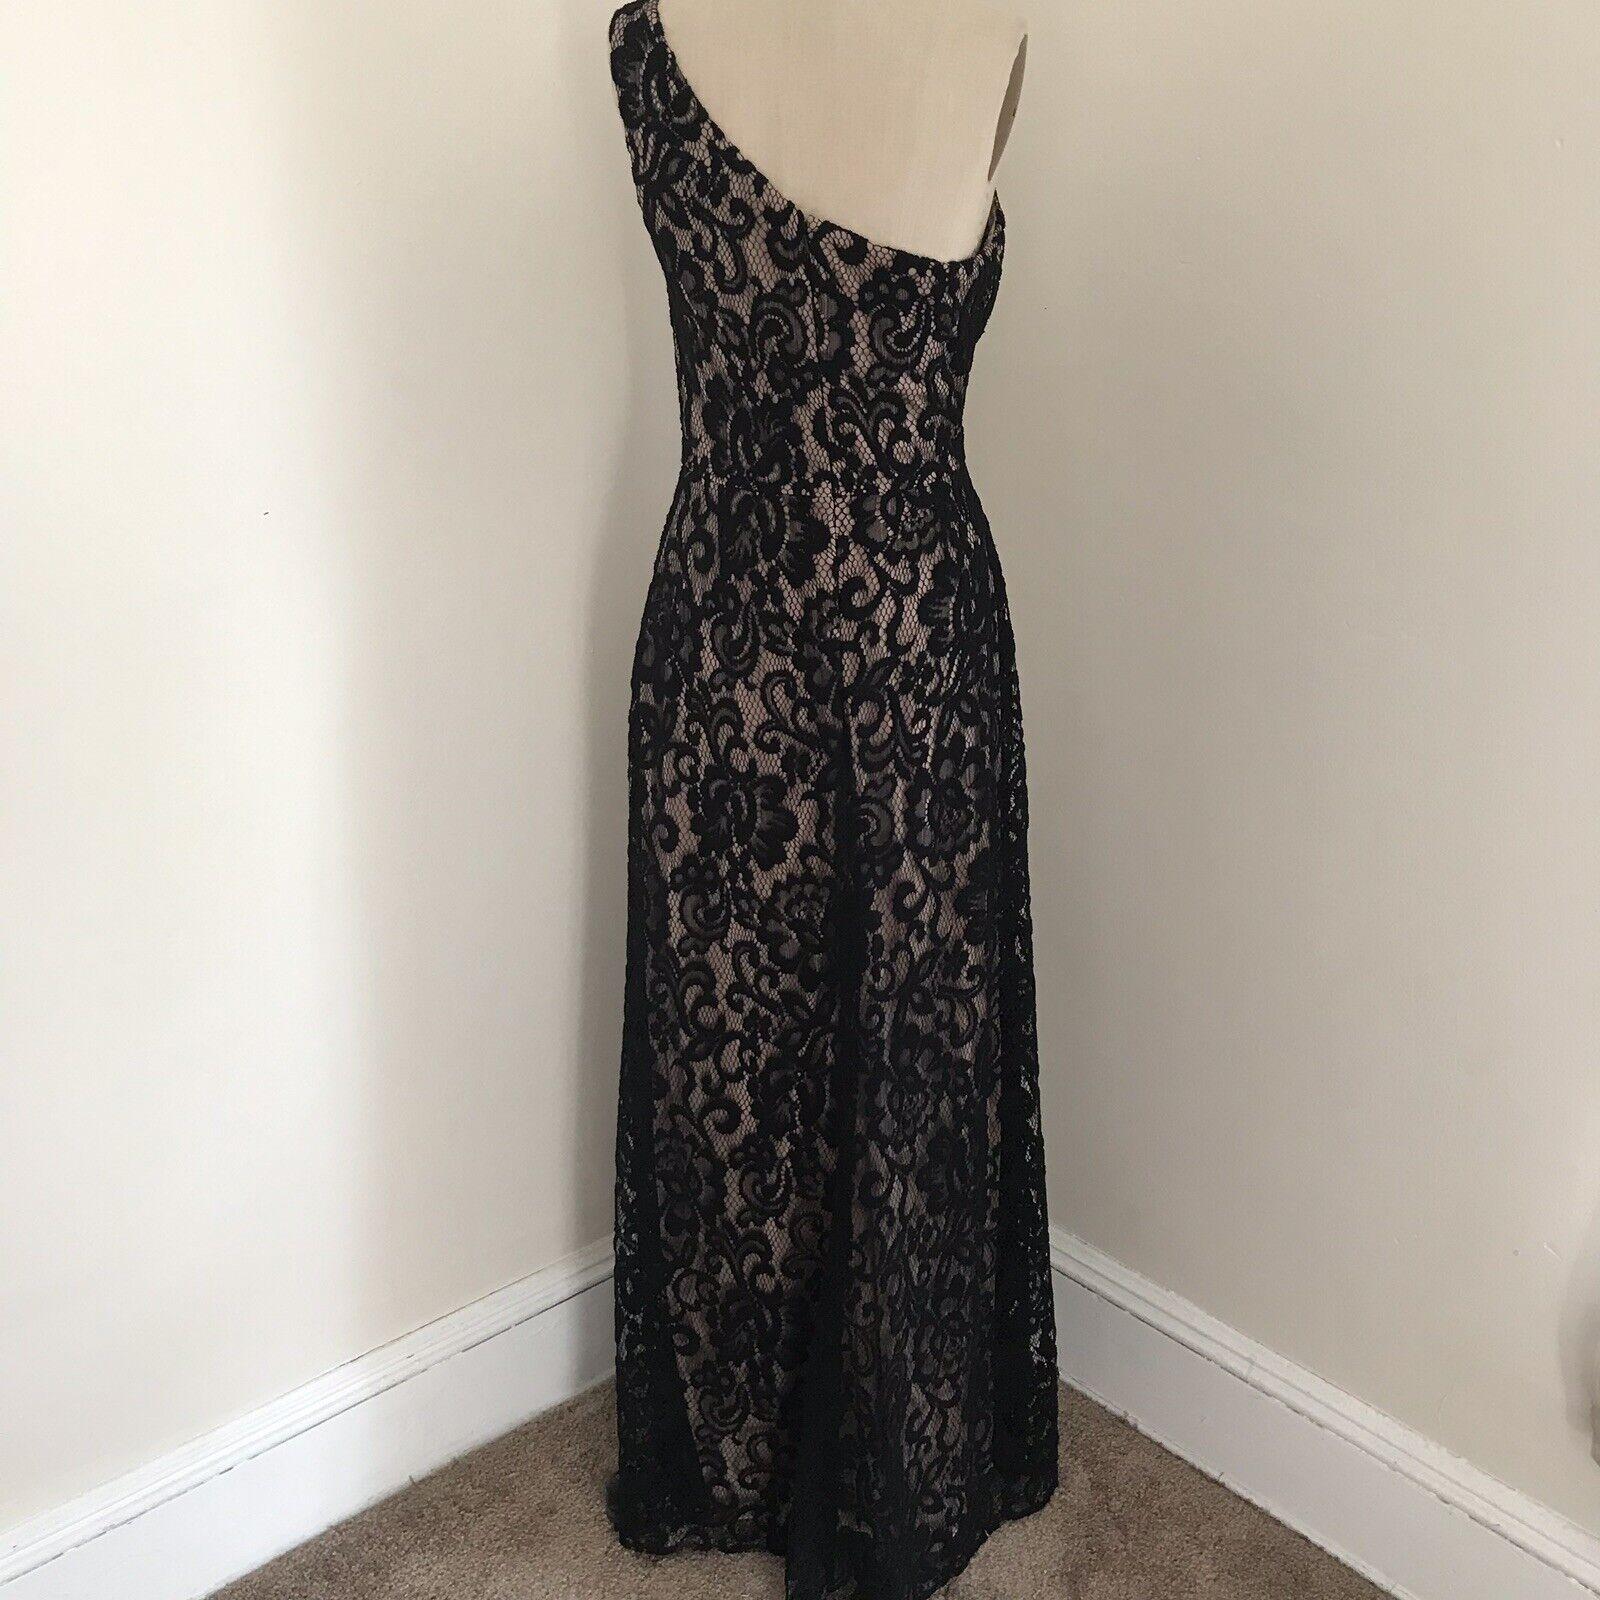 Dessy Collection Gown Black Lace One Shoulder Dre… - image 4